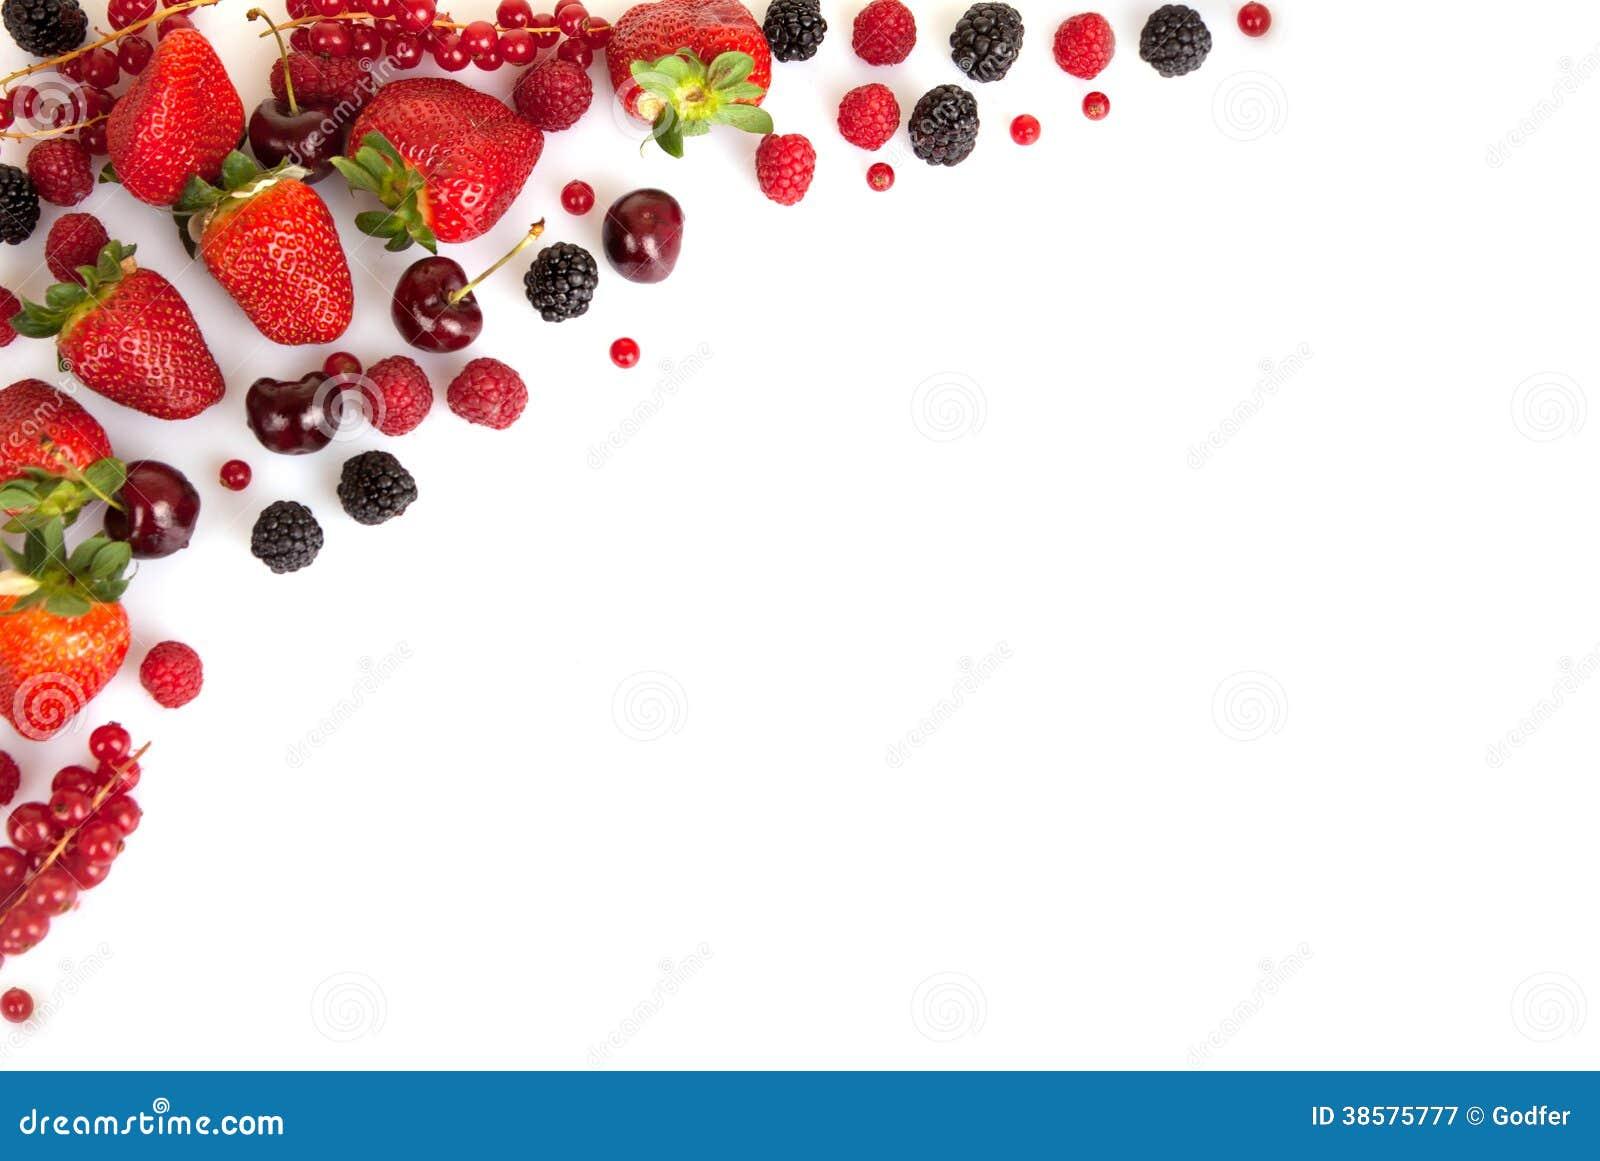 Frame Border Or Edge Of Red Fresh Summer Fruits Royalty